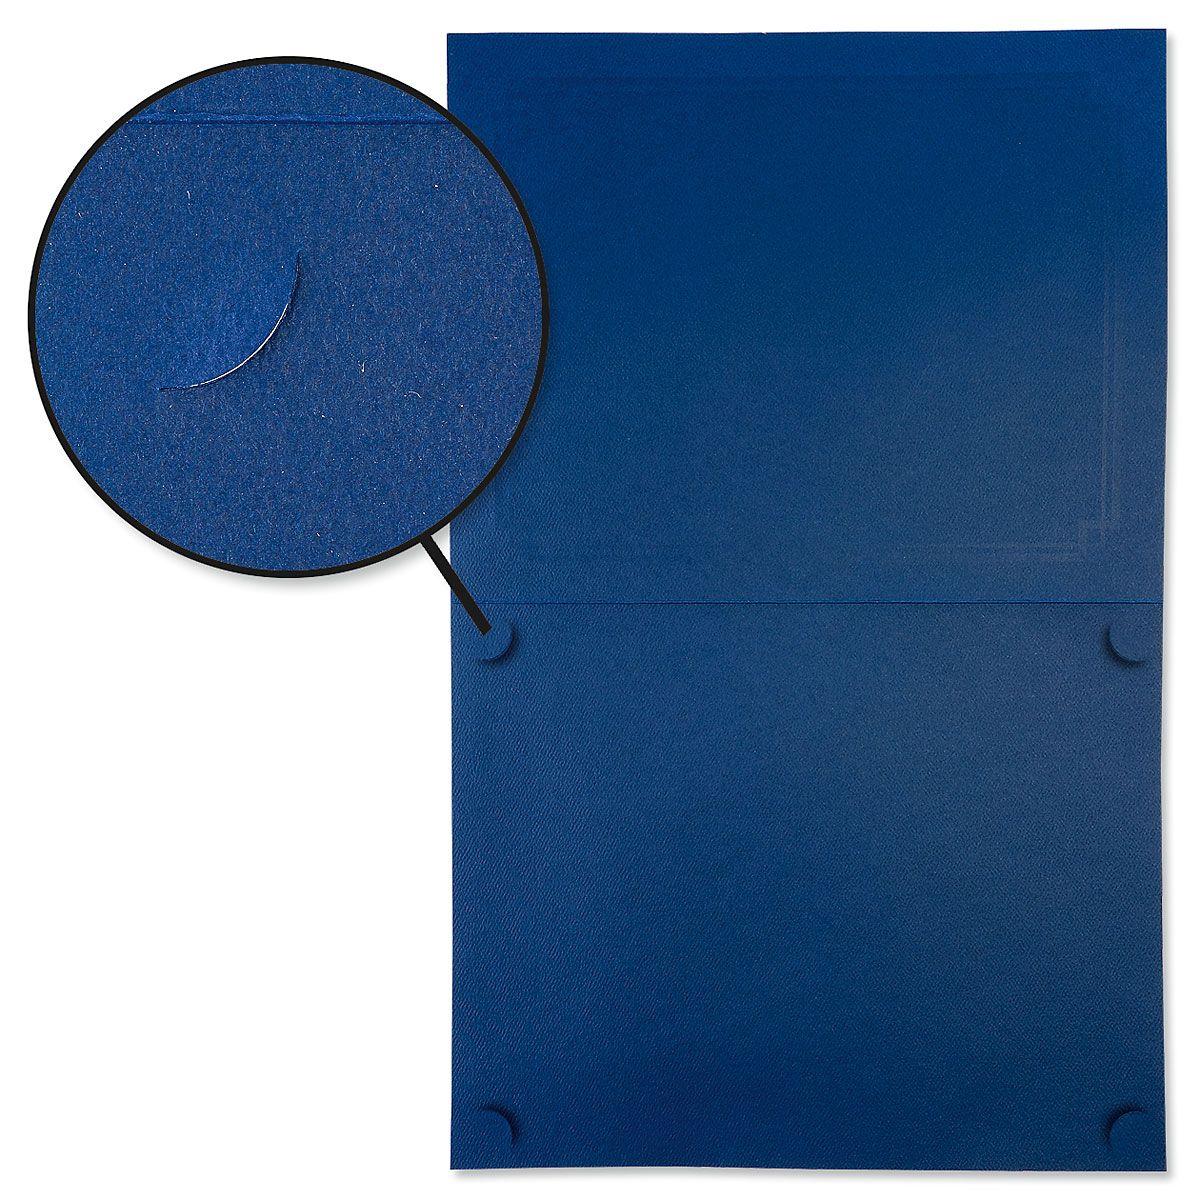 Ornate Blue Certificate Folder with Silver Border/Crest - Set of 50